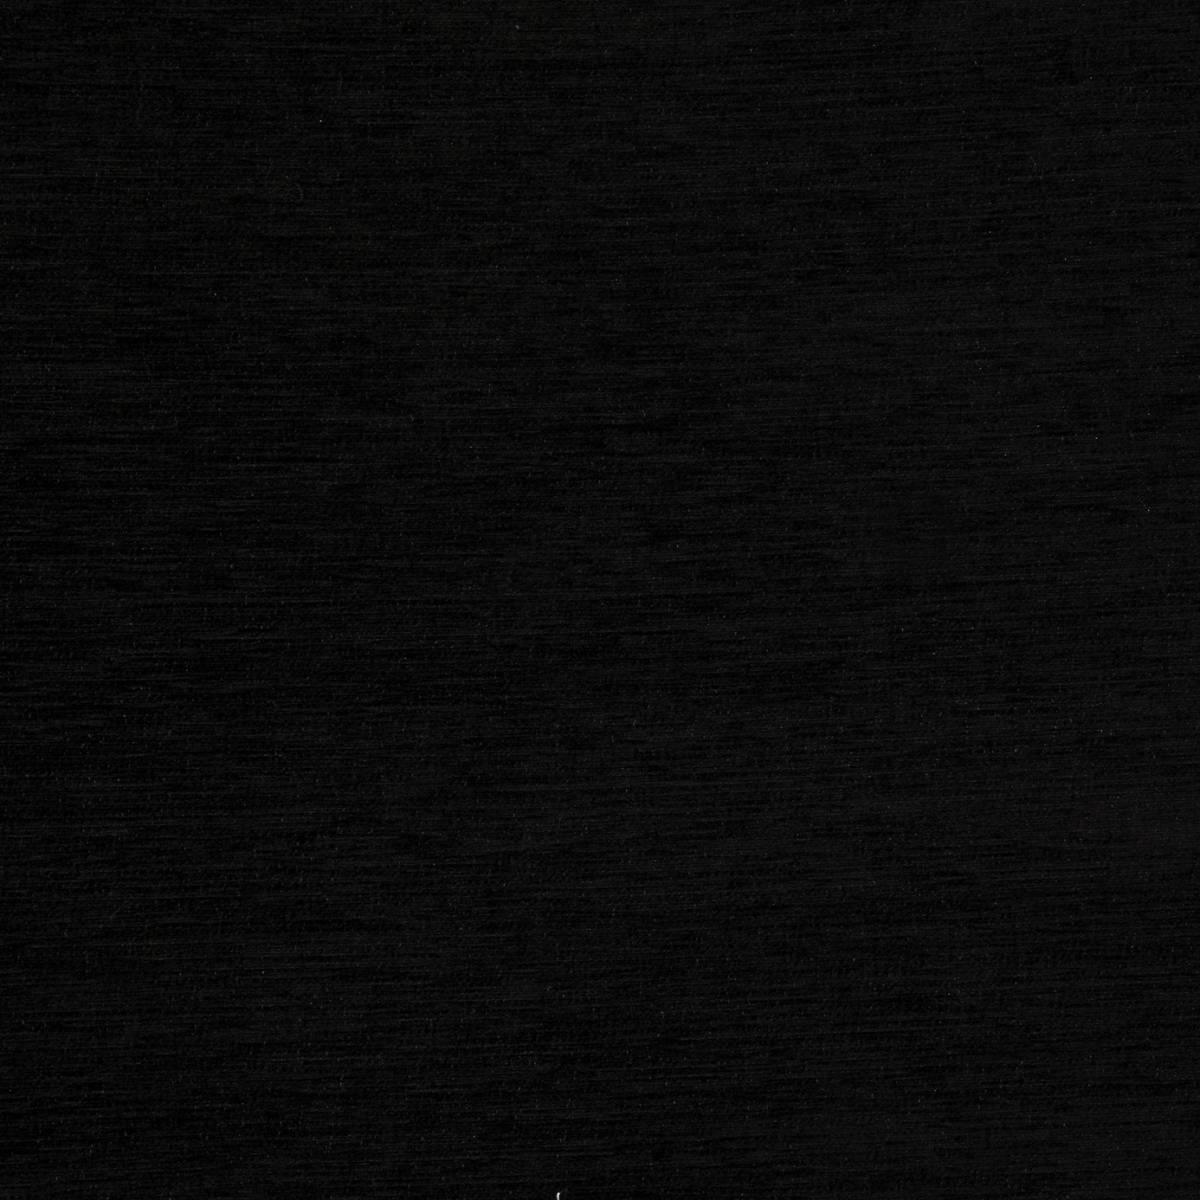 Roman Blinds In Kensington Fabric Black Kensingtonblack Fryetts Kensington Fabrics Collection